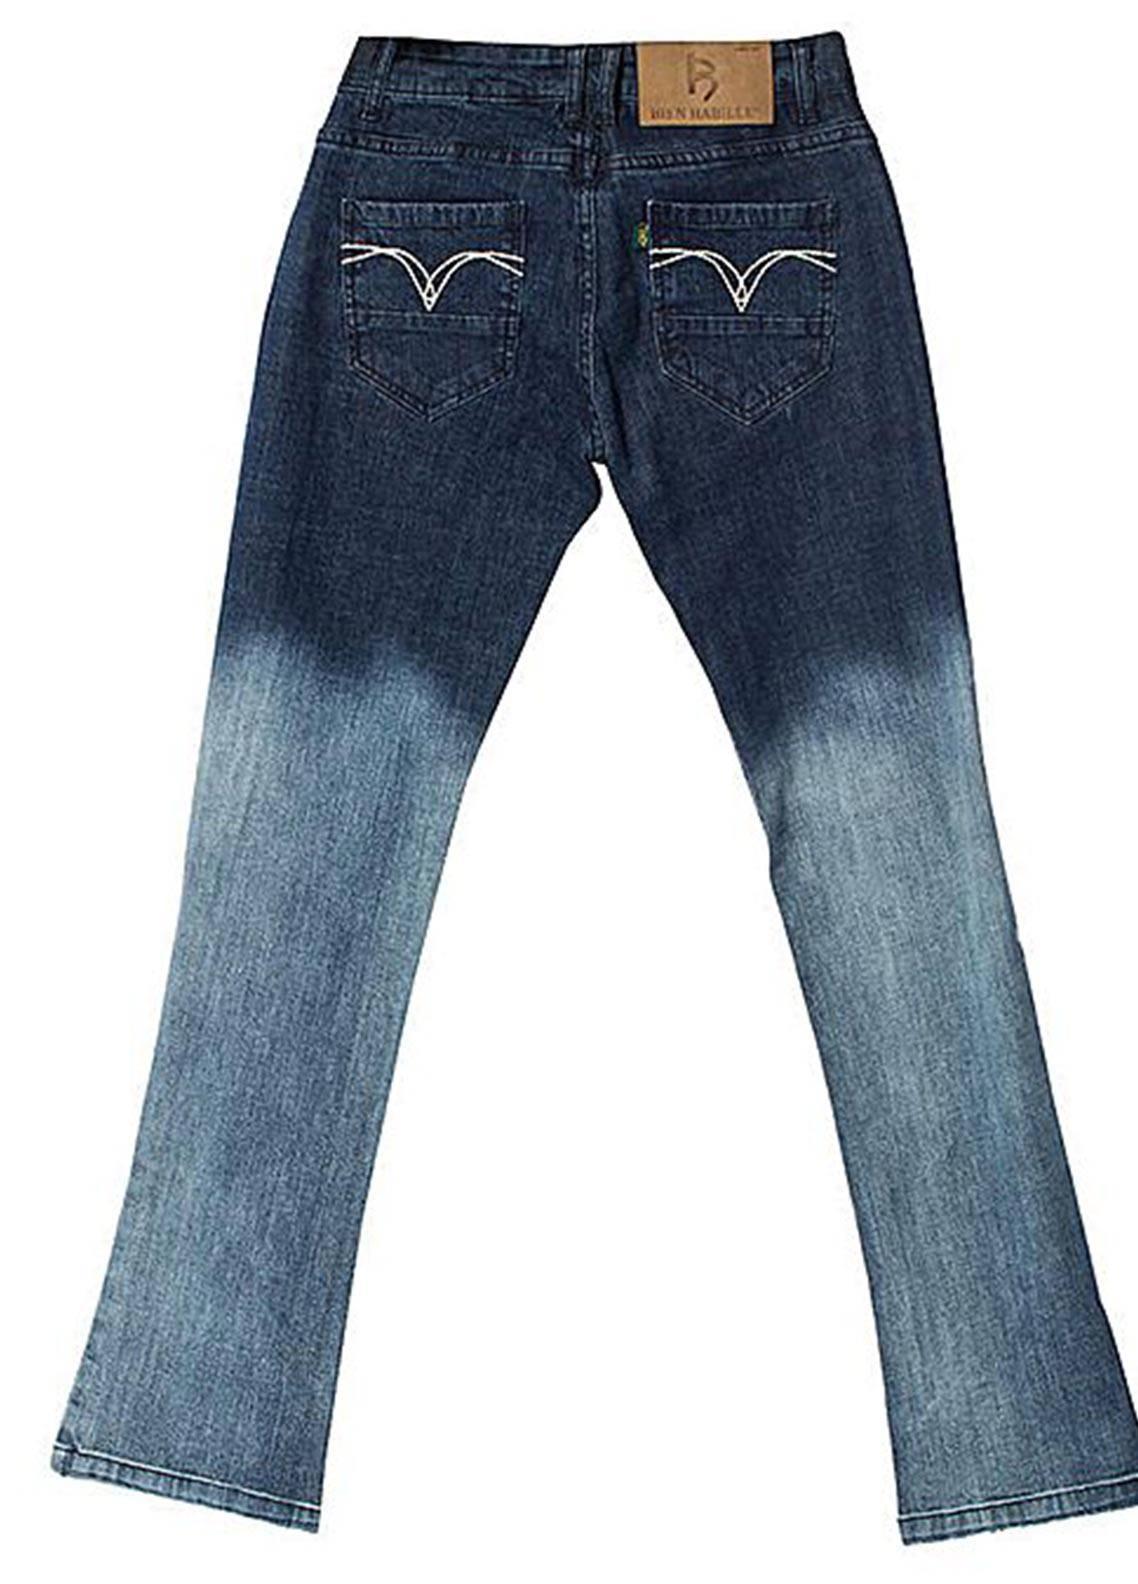 Bien Habille Jeans Casual Fit Blue Light & Dark